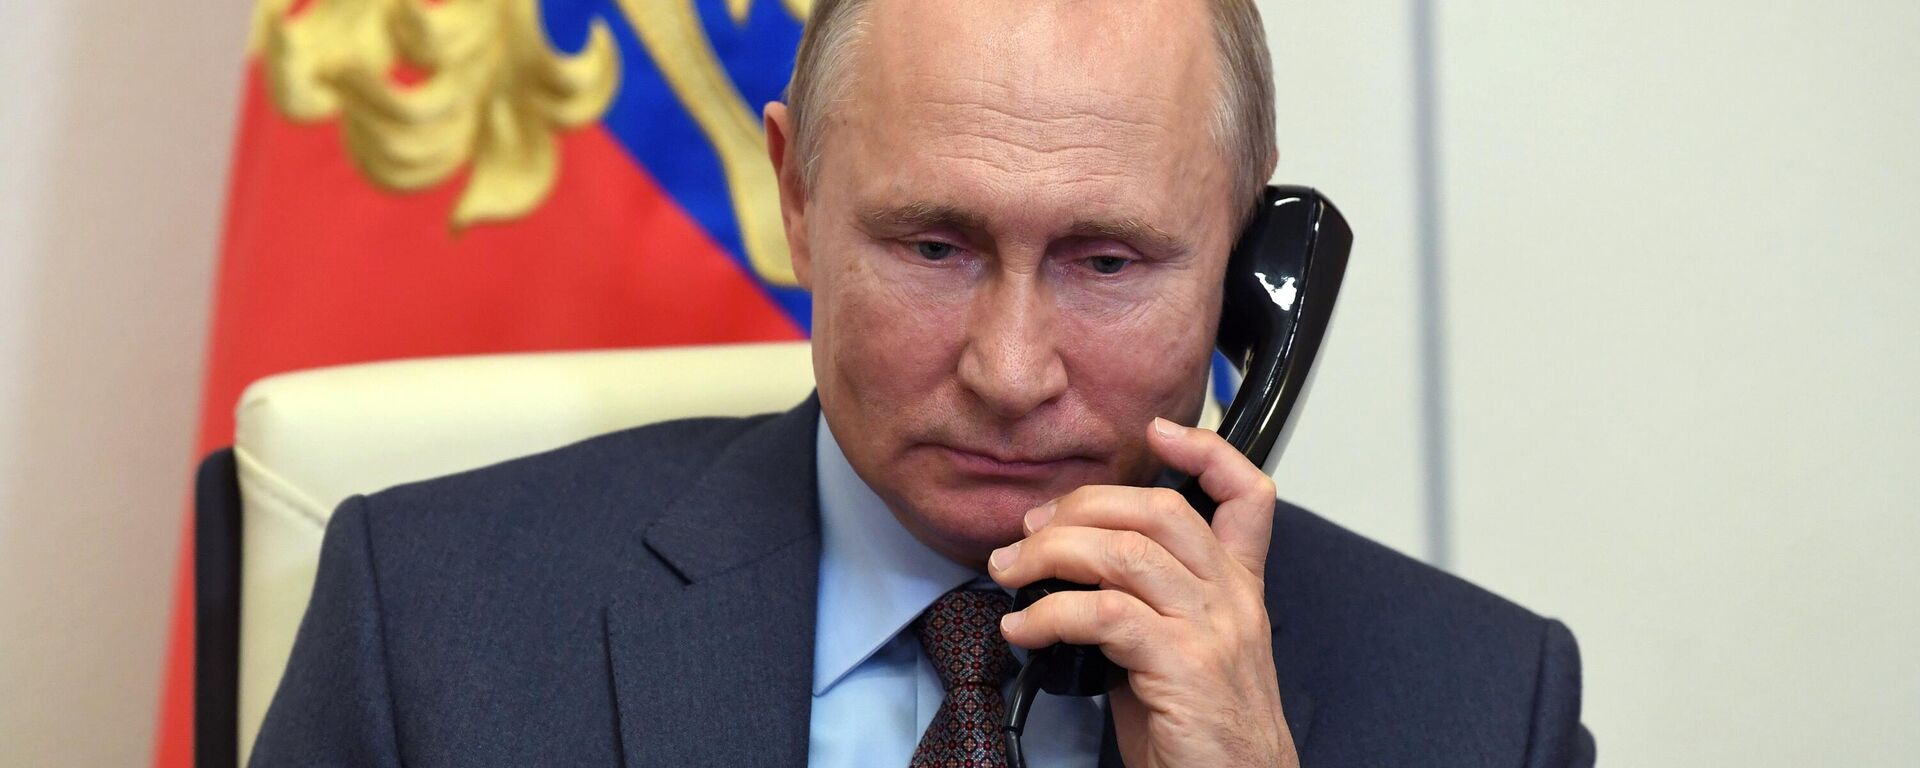 Wladimir Putin am Telefon (Archivbild) - SNA, 1920, 26.01.2021